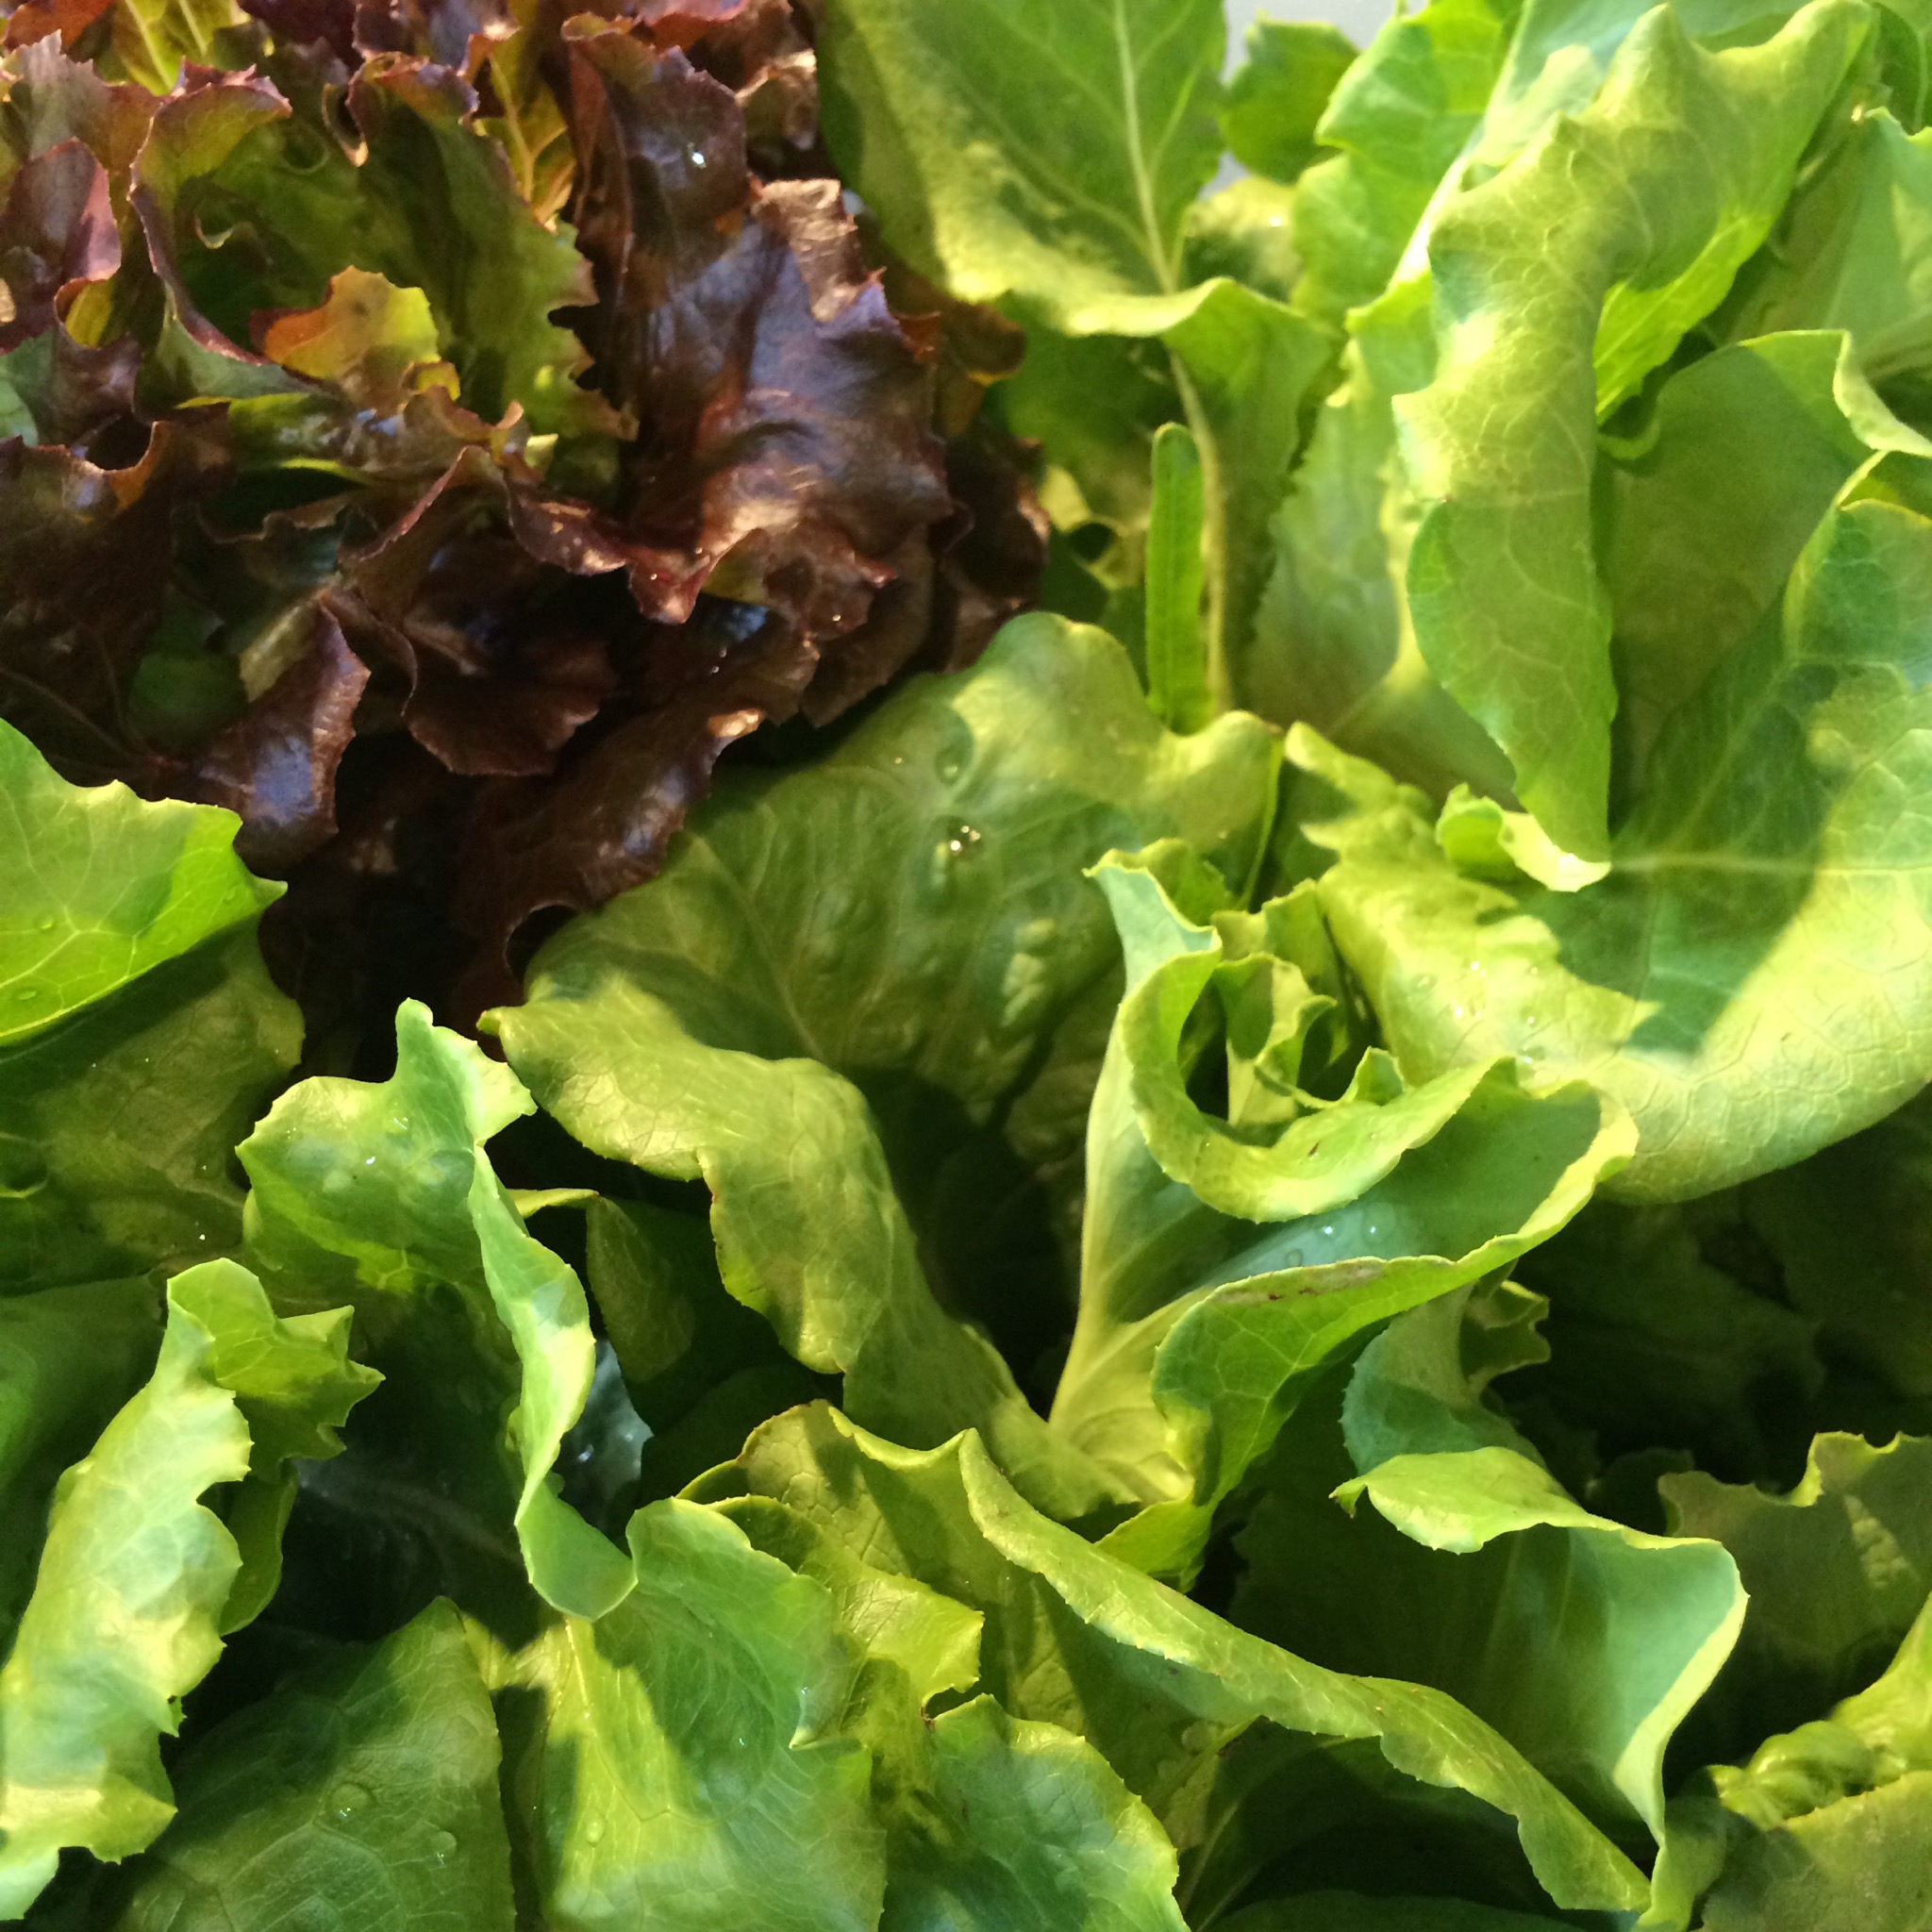 ARTfarm Salad Greens Thursday 7/29/2021, Preorders 5-6pm: Reserve your pickup slot!